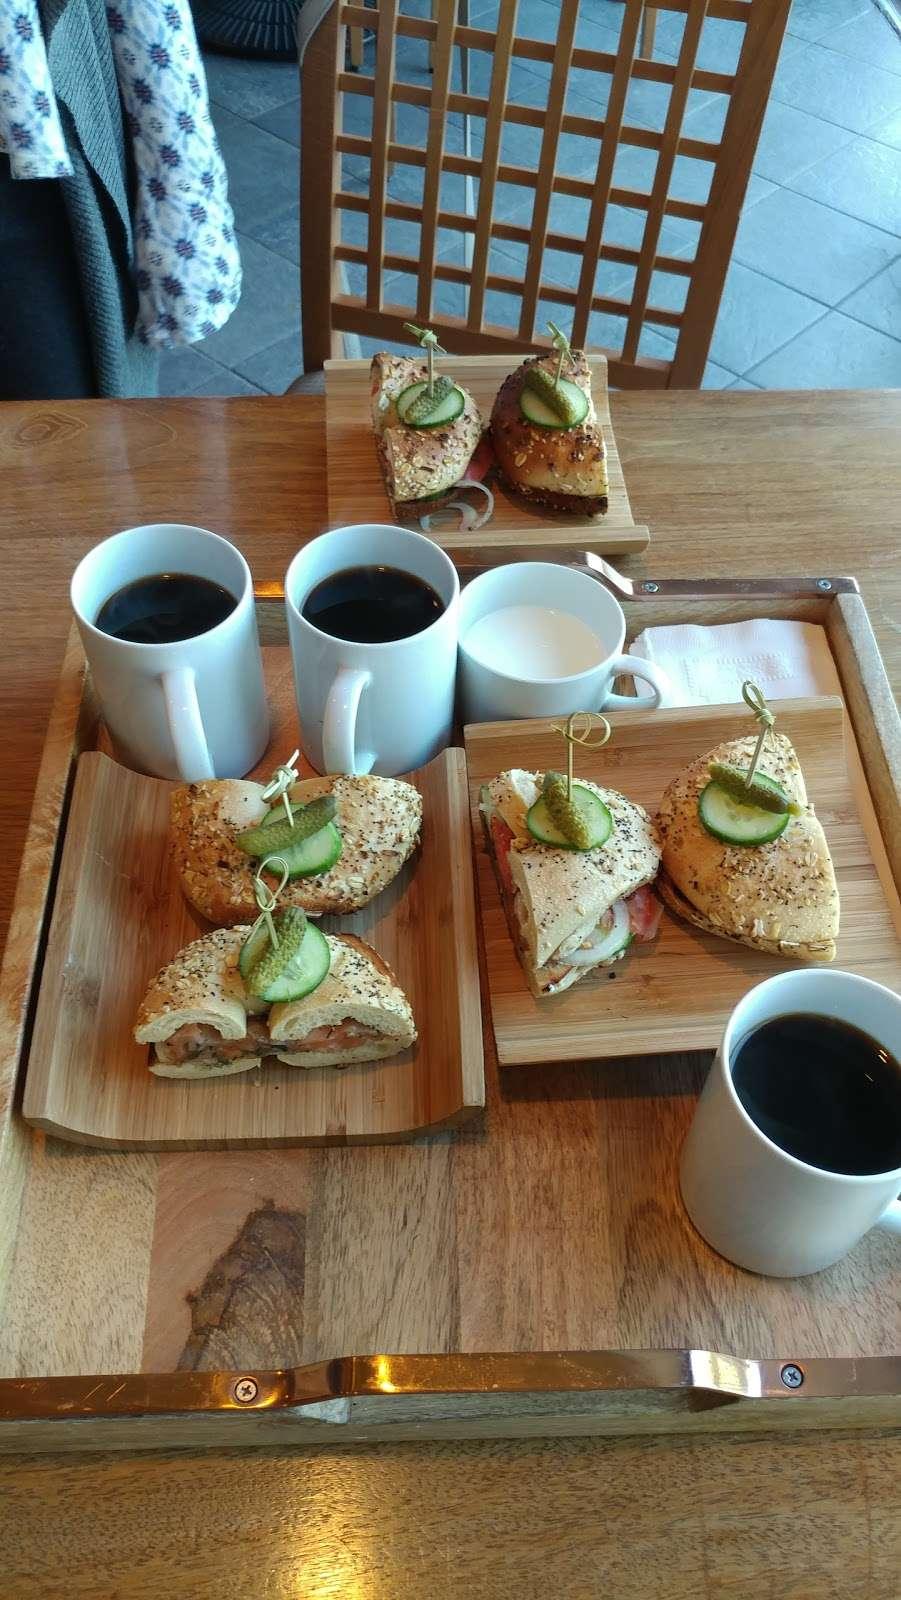 Lox Cafe - restaurant  | Photo 7 of 10 | Address: 2, 36 Battery Pl, New York, NY 10280, USA | Phone: (646) 437-4231